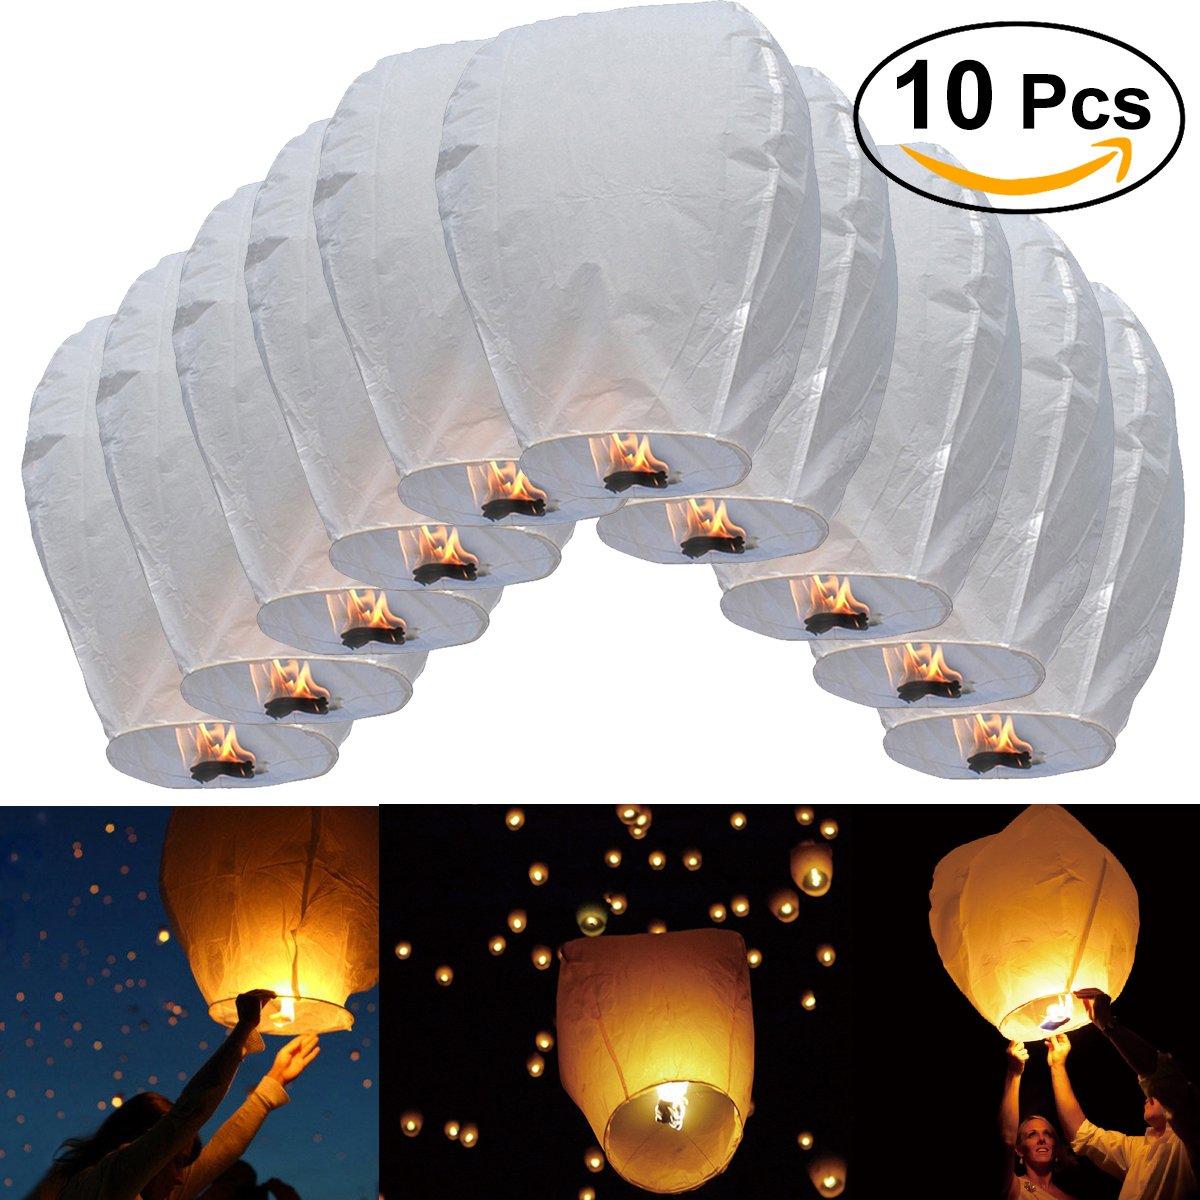 LEORX Sky Lantern 10Pcs Oval Sky Lantern Chinese Kongming Lantern Wish Lamp Wedding Party Christmas Decoration